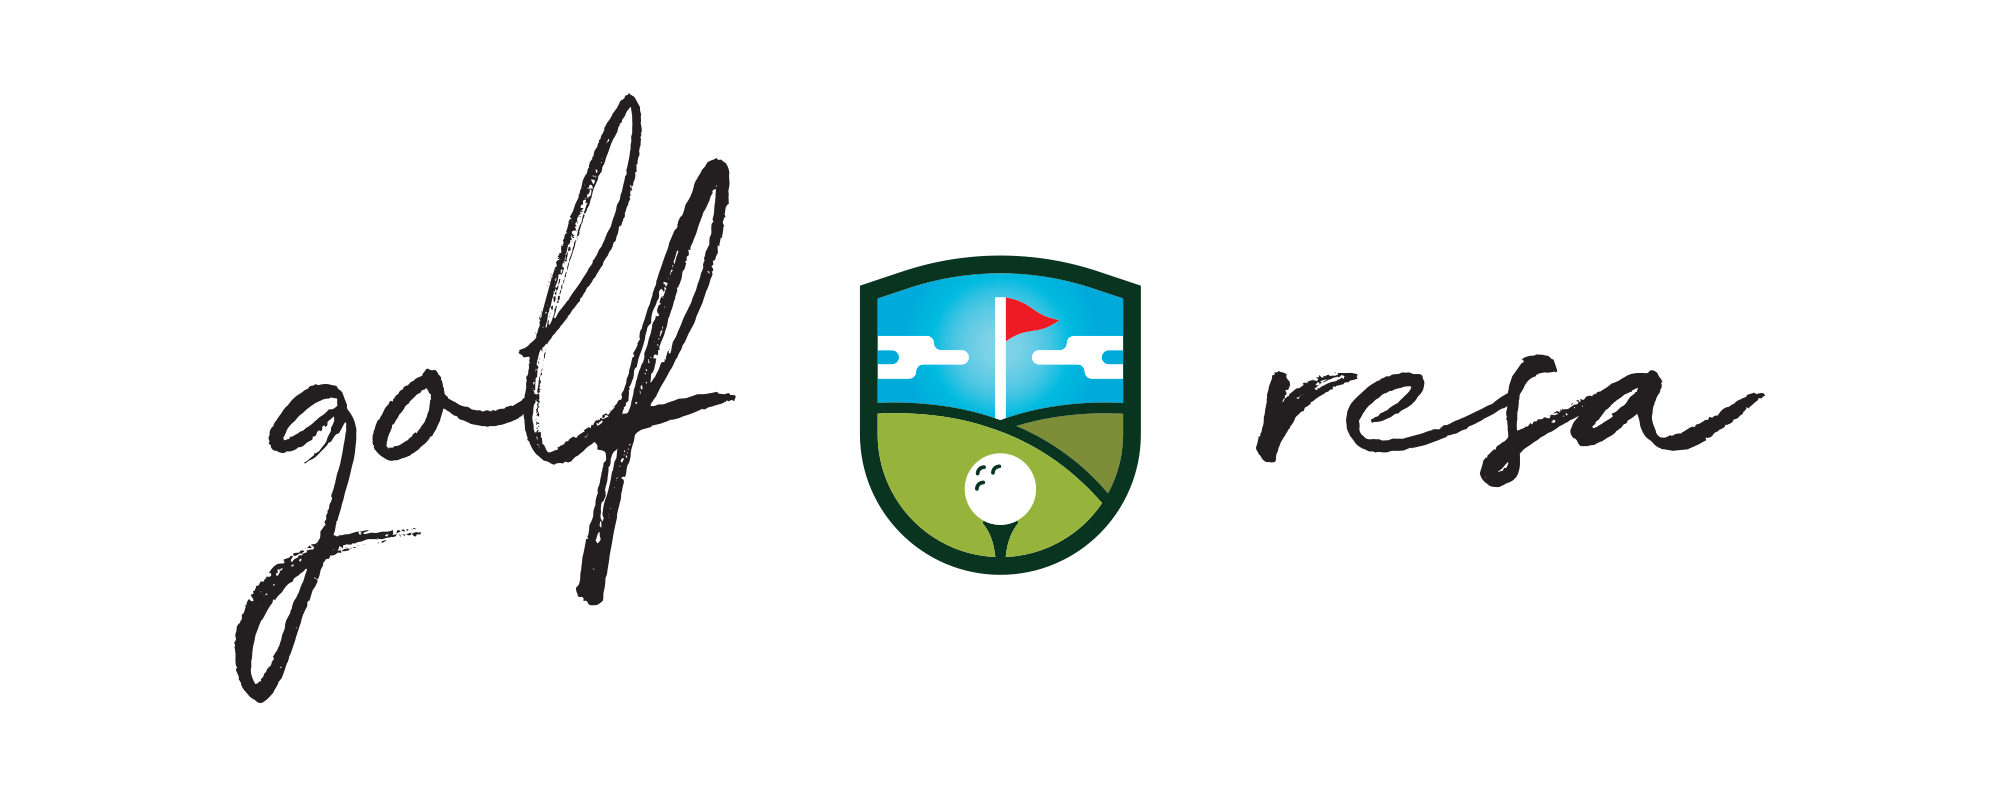 golf-resa logo